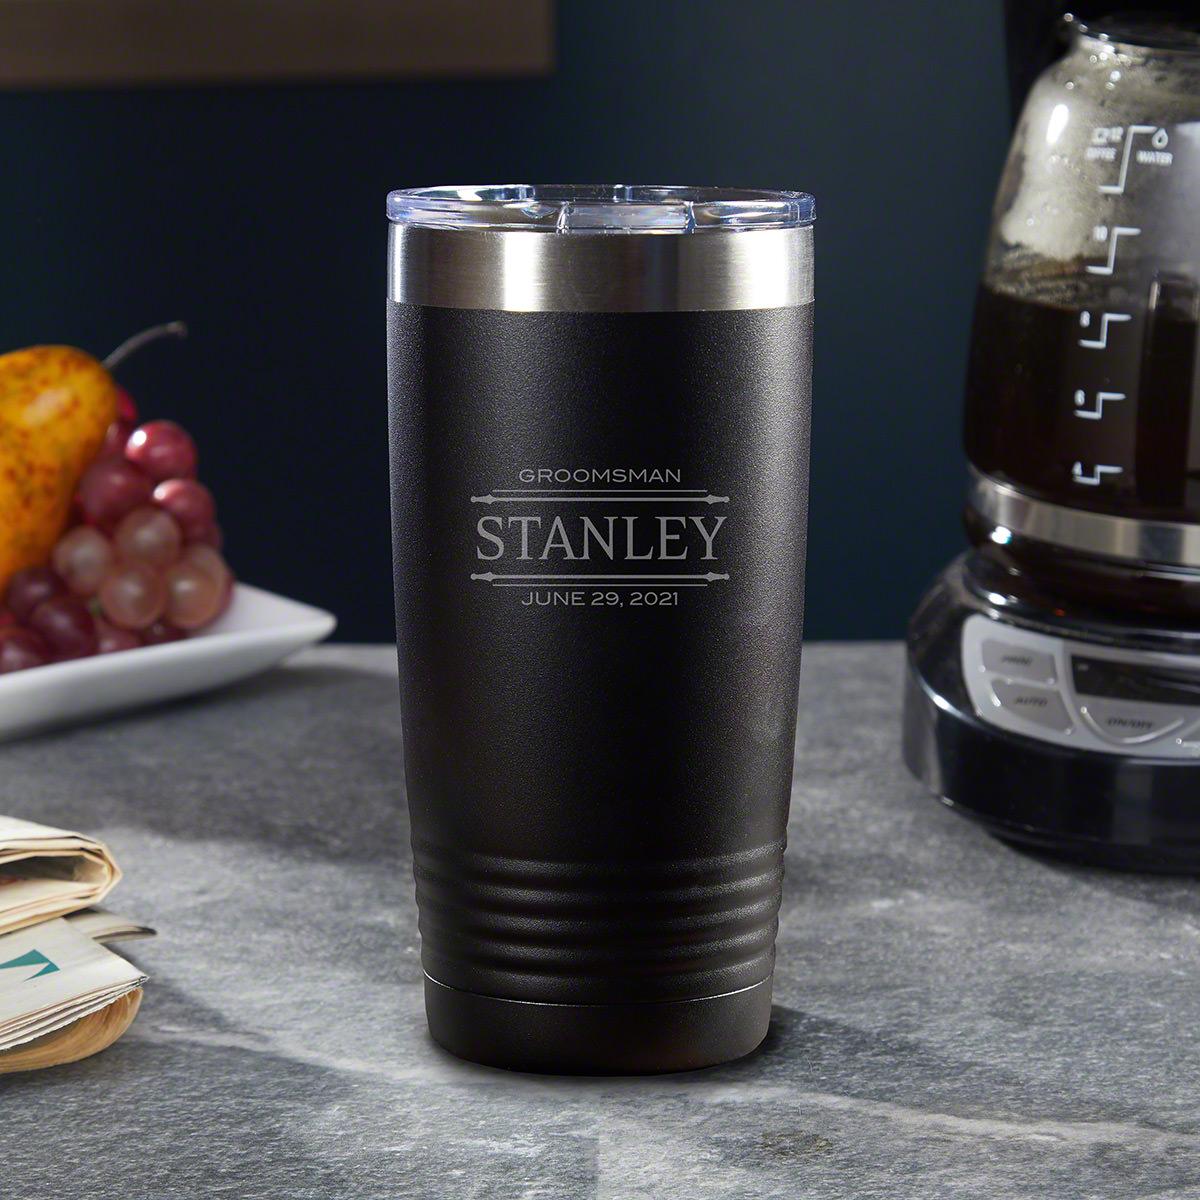 Stanford Stainless Steel Insulated Tumbler Gift for Groomsmen